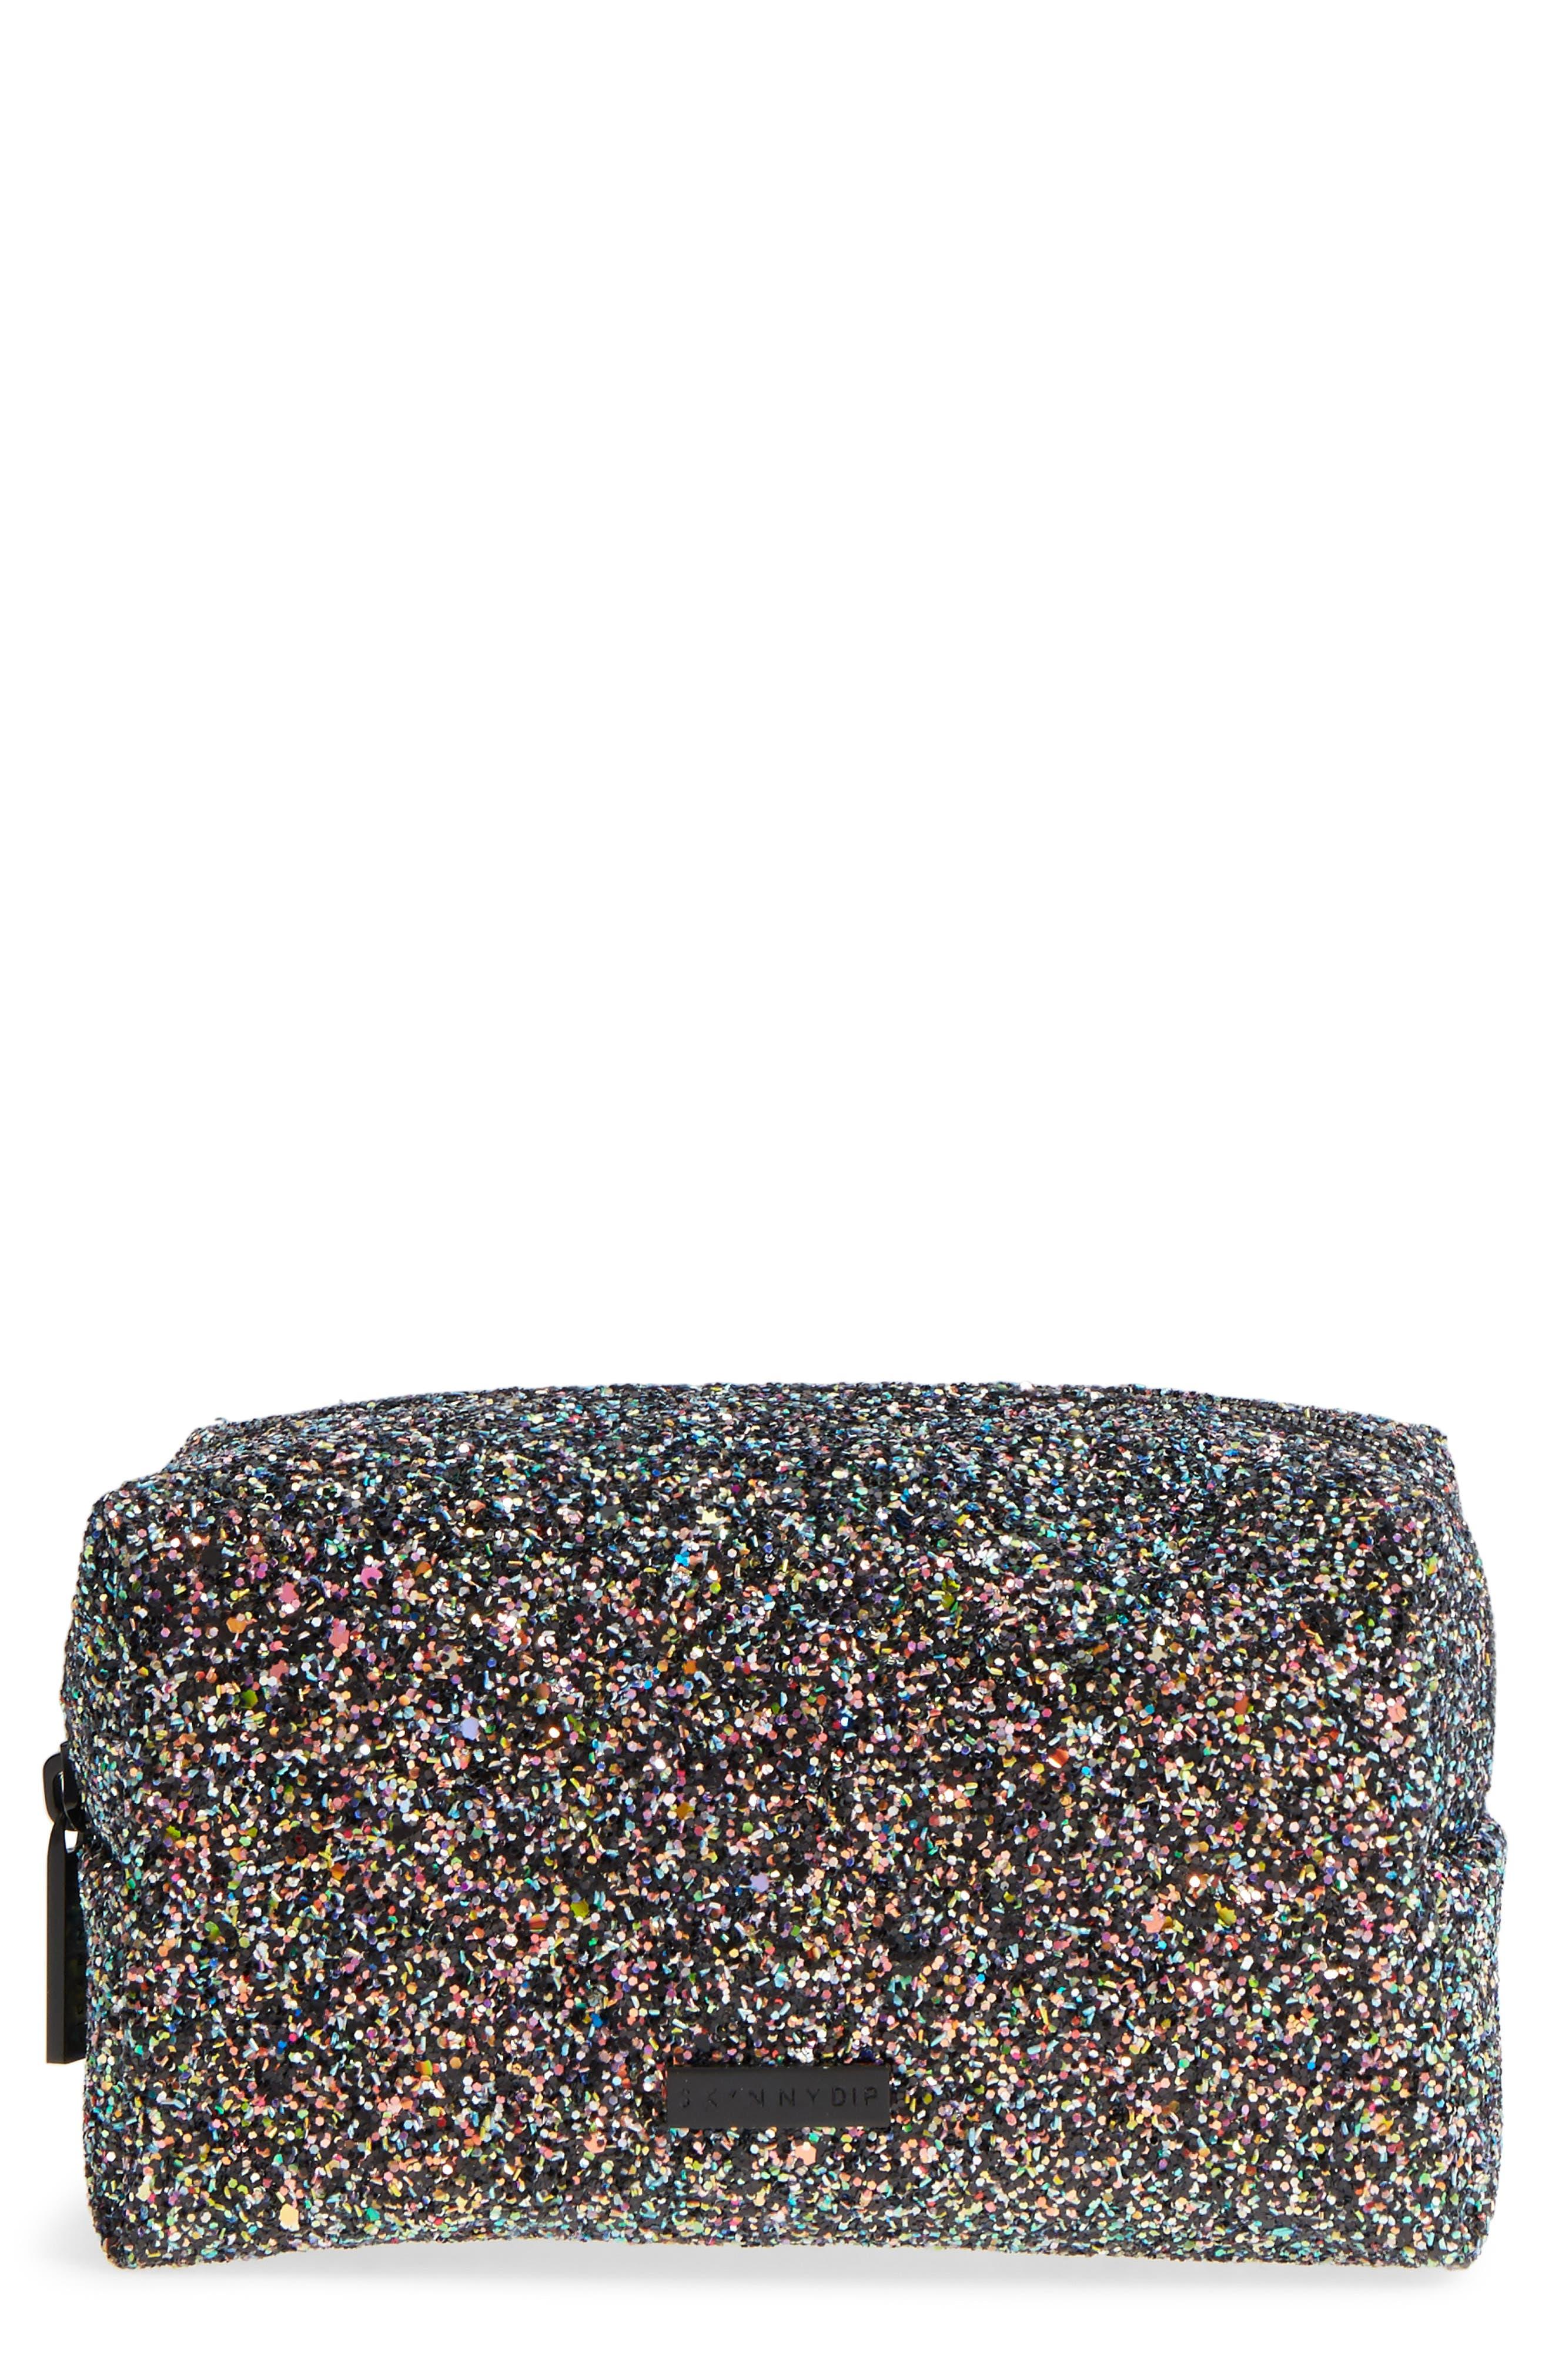 Skinny Dip Liquorice Glitter Cosmetics Bag,                         Main,                         color, 000